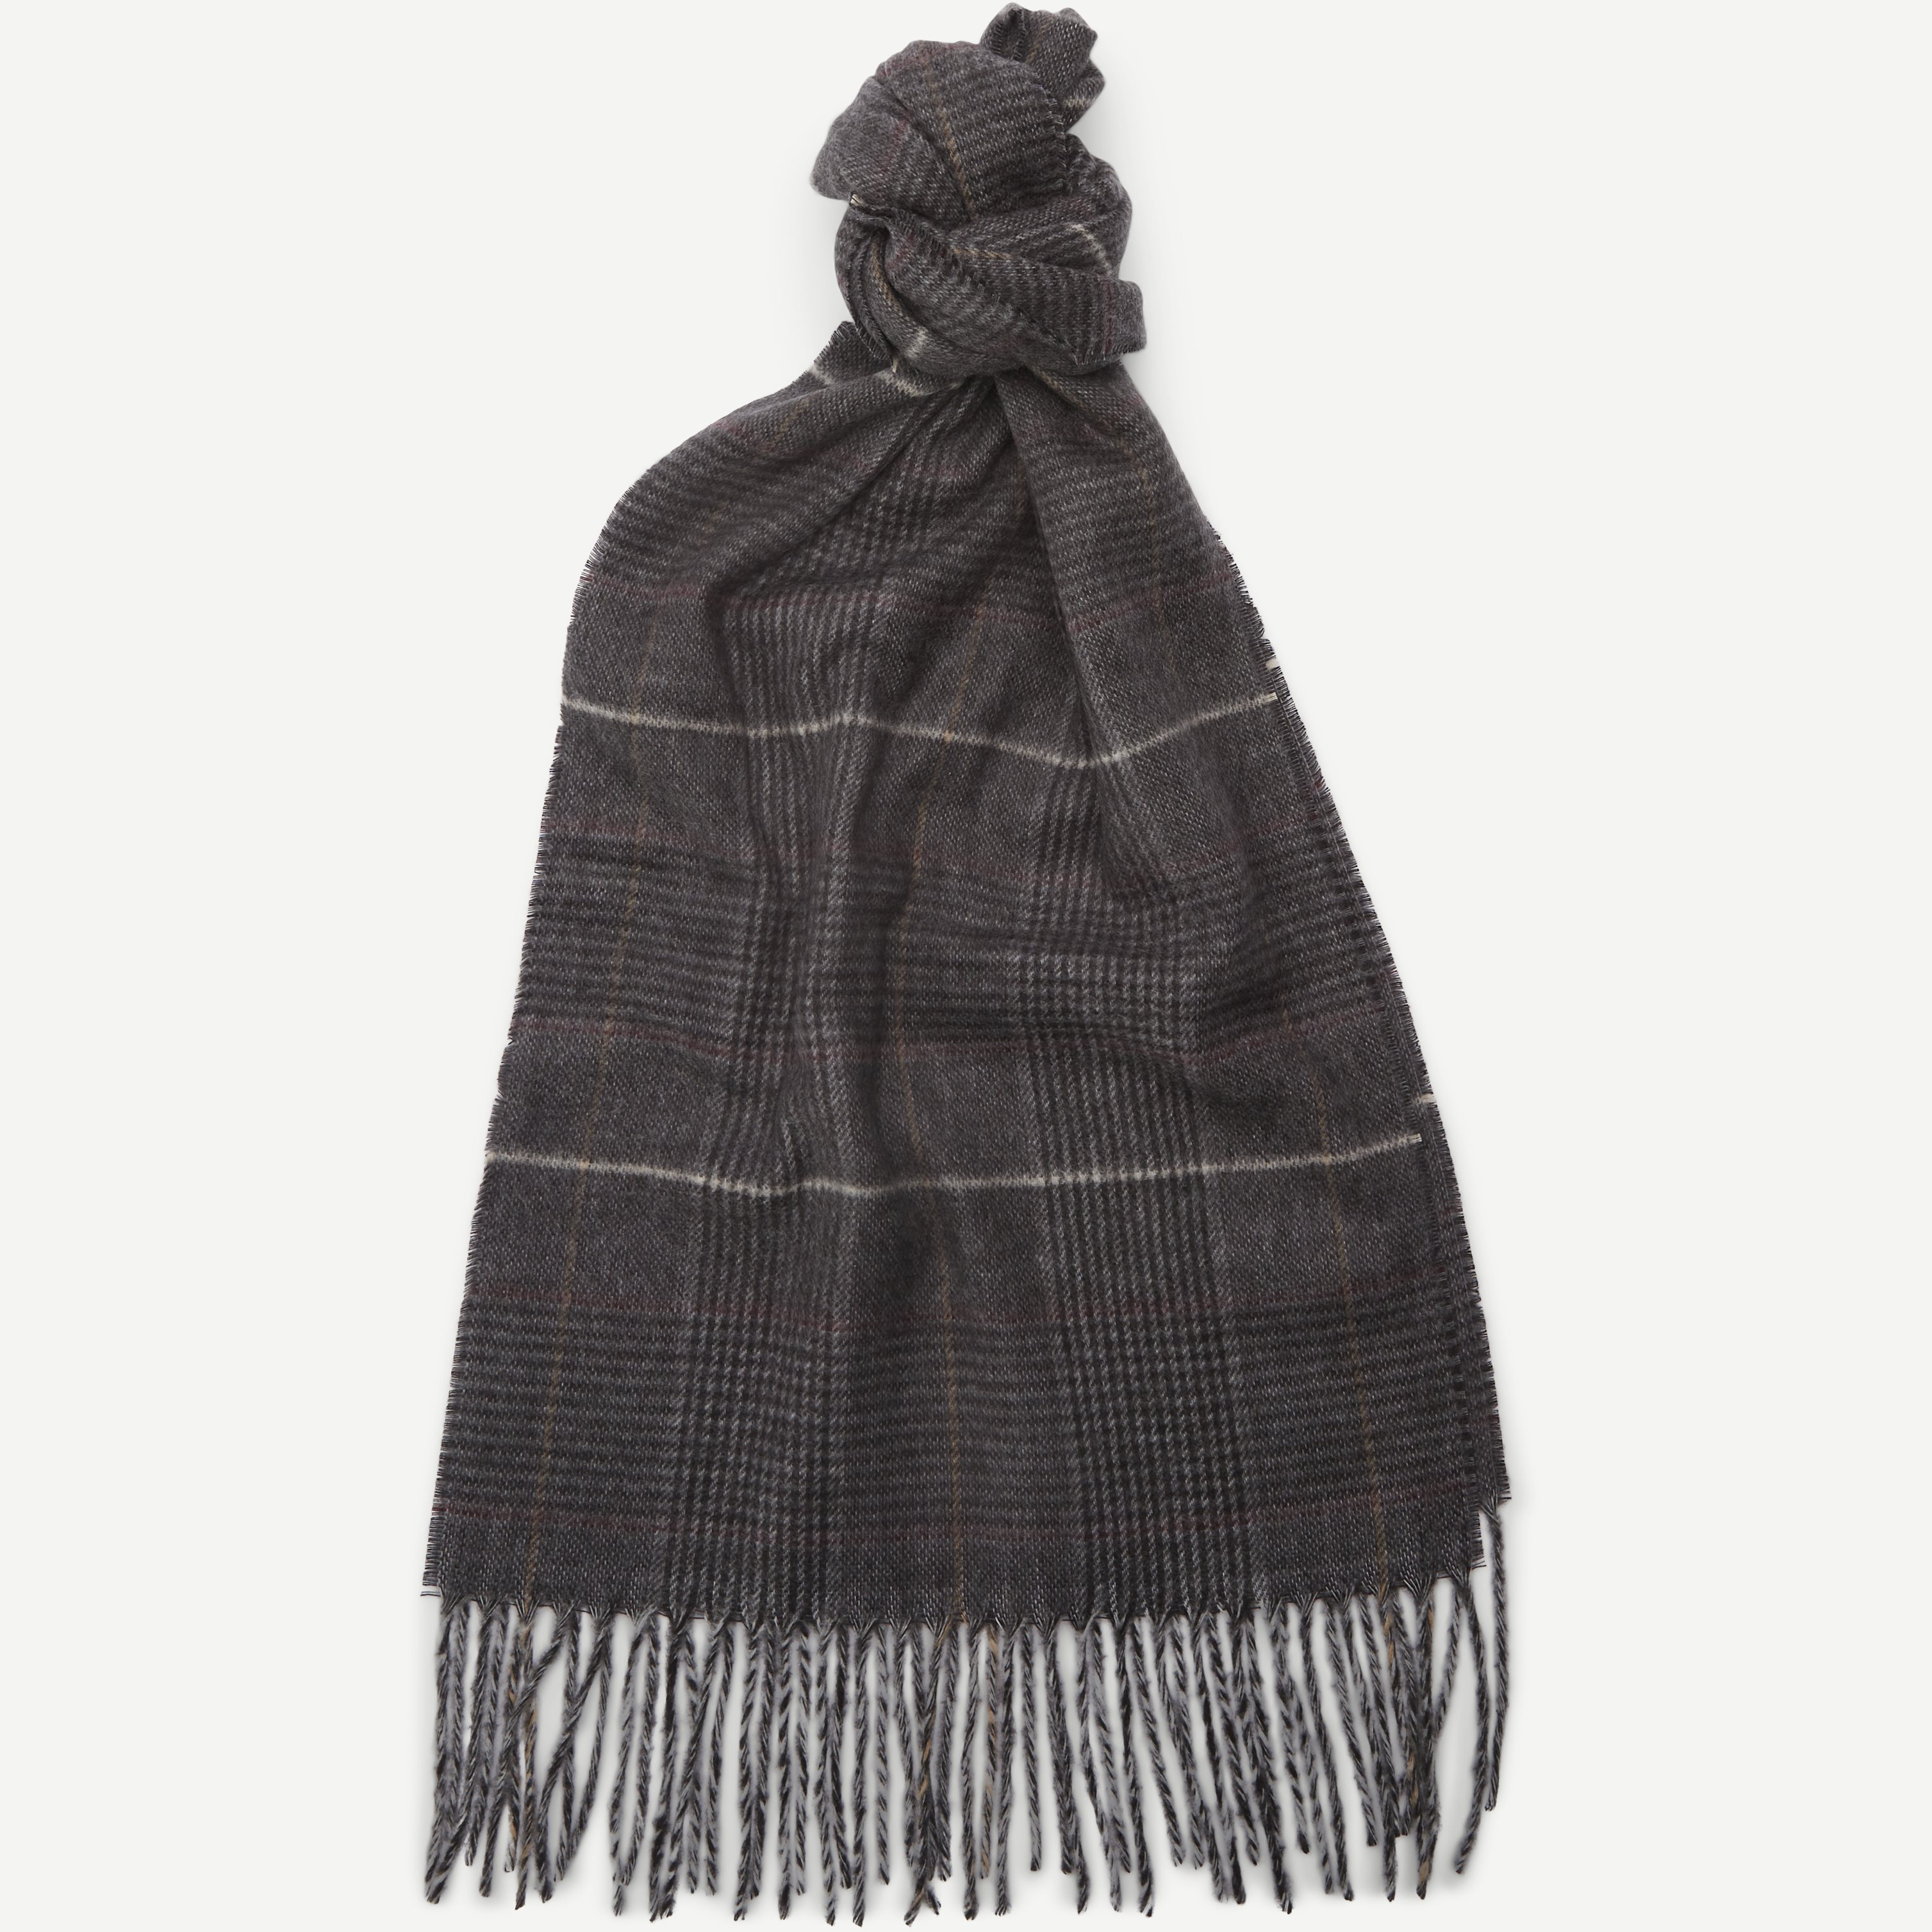 Malaga Halstørklæde - Halsdukar - Grå